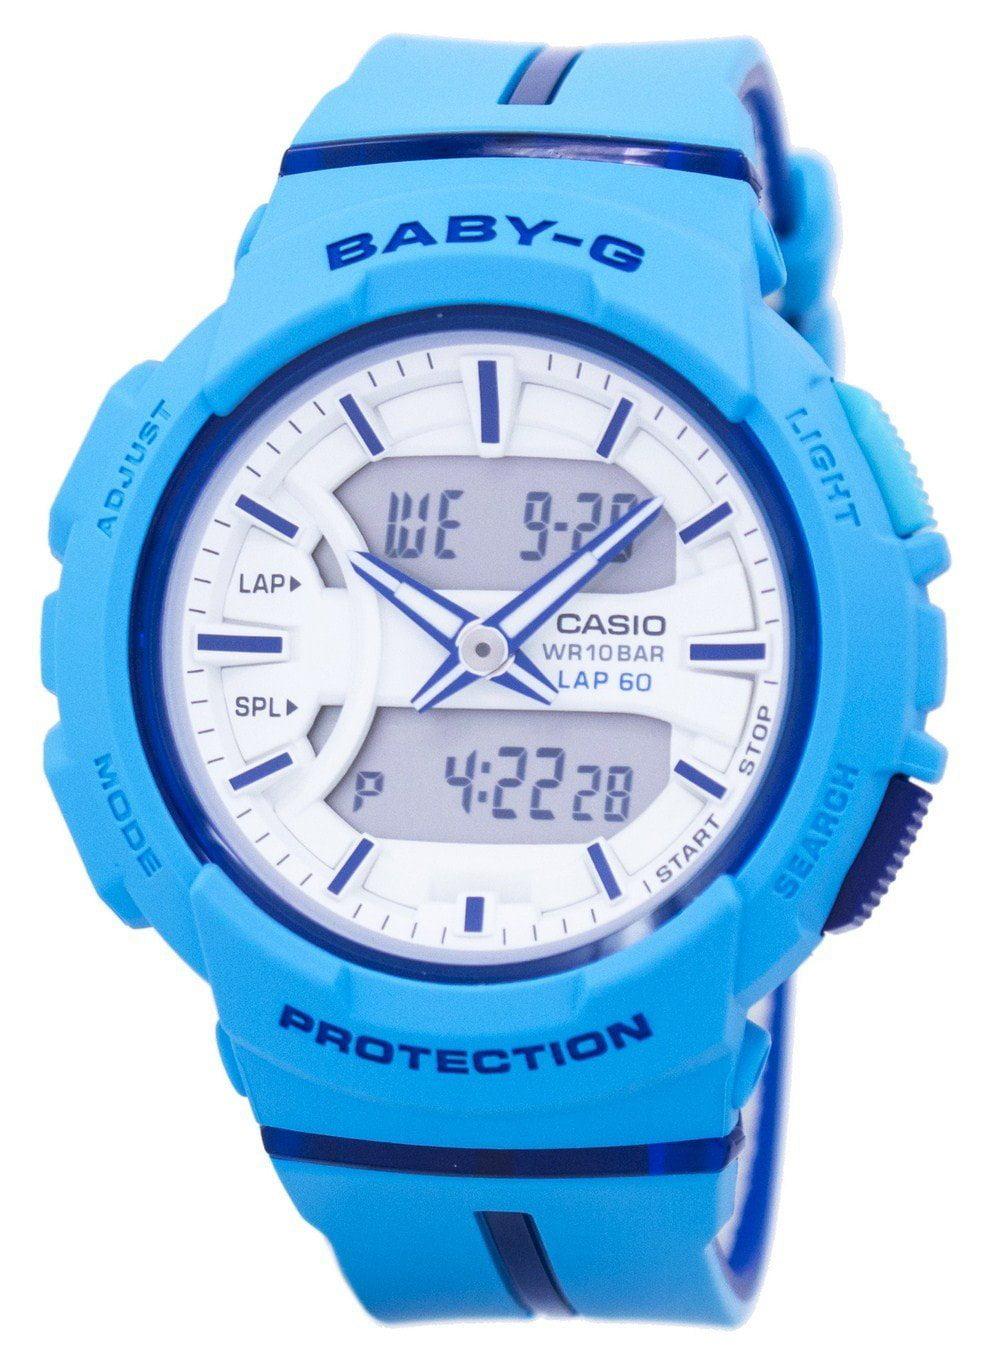 Casio Baby-G Shock Resistant Dual Time Analog Digital BGA-240L-2A2 Womens Watch